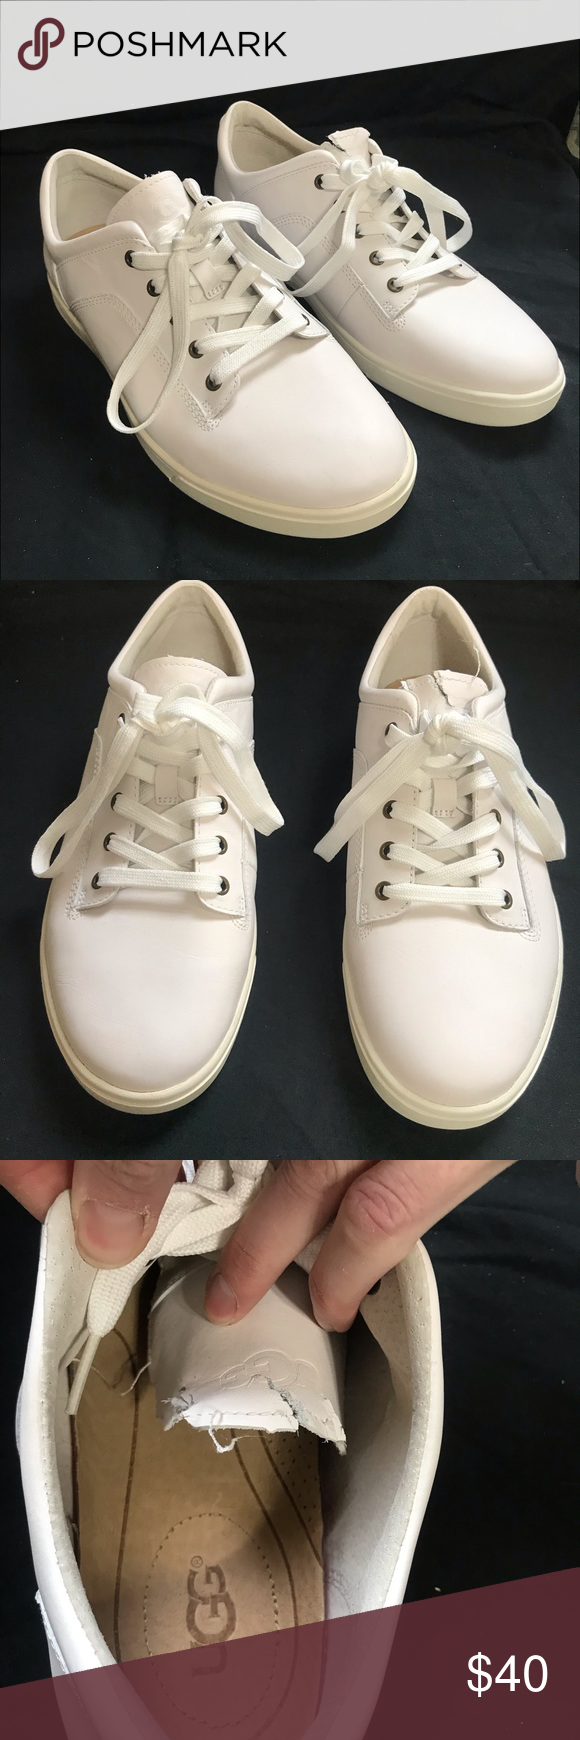 UGG Men's White Tennis Shoe size 9.5